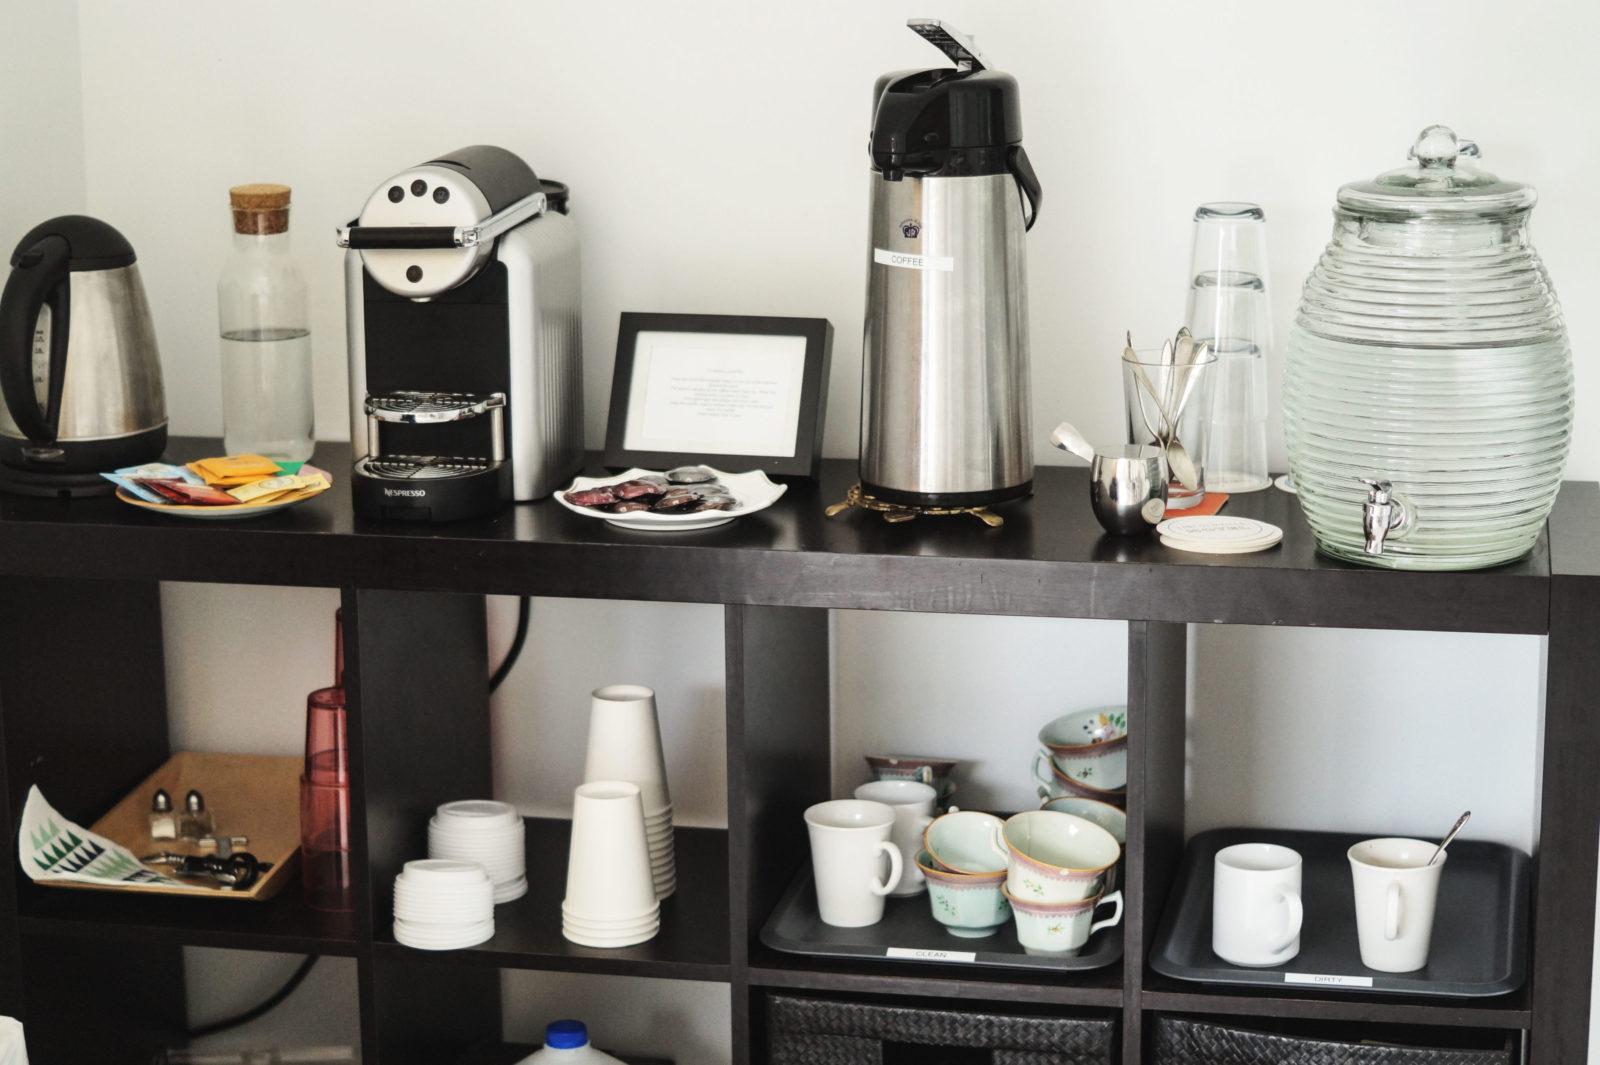 Hotel Review Lincolnville Motel Maine USA Travel Plattenspieler Erfahrung Kaffee Aufenthaltsraum